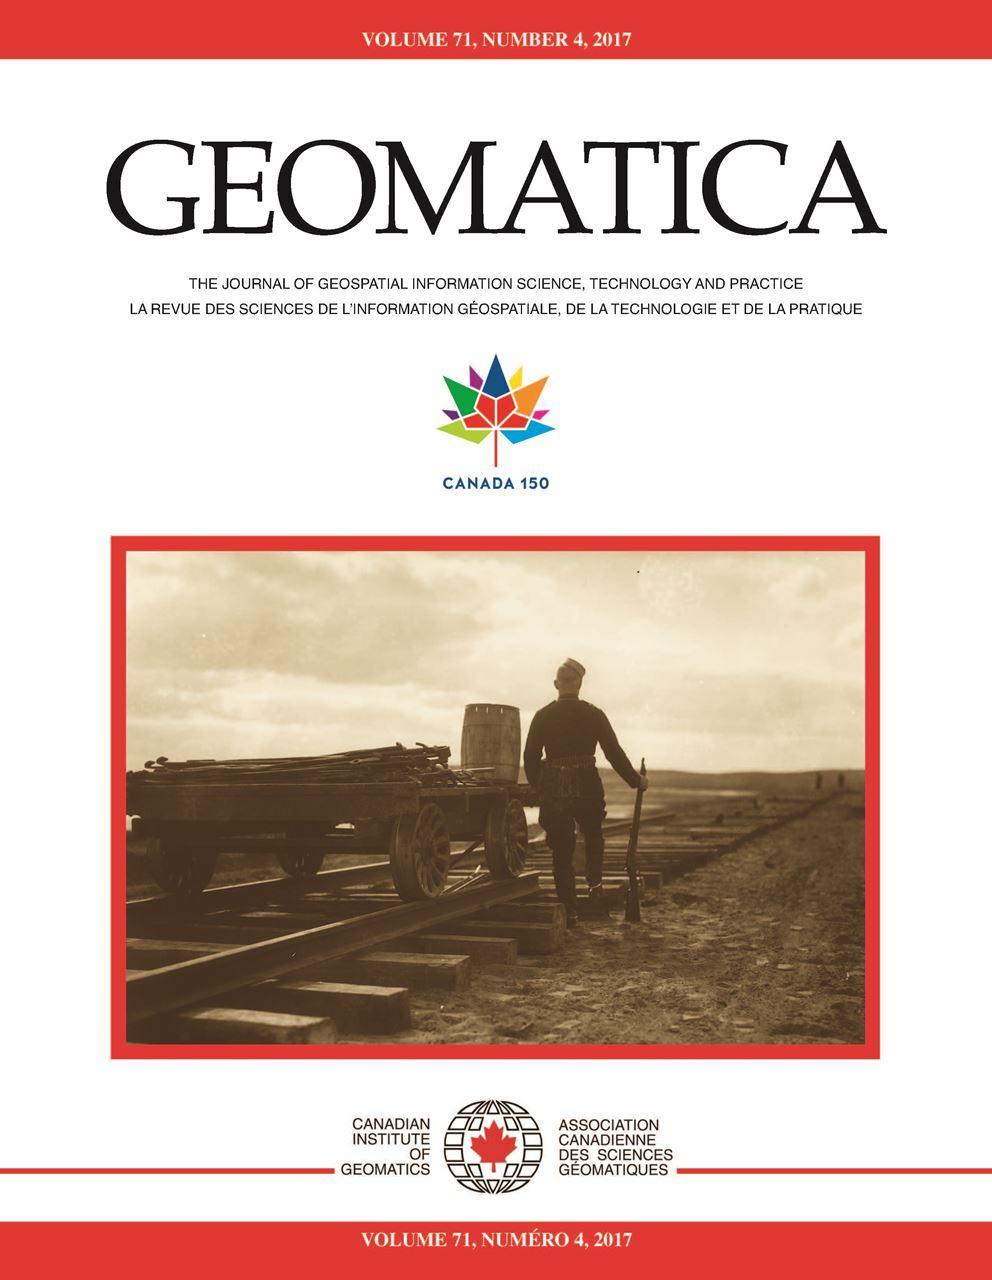 Canadian Institute of Geomatics / Association canadienne des ...